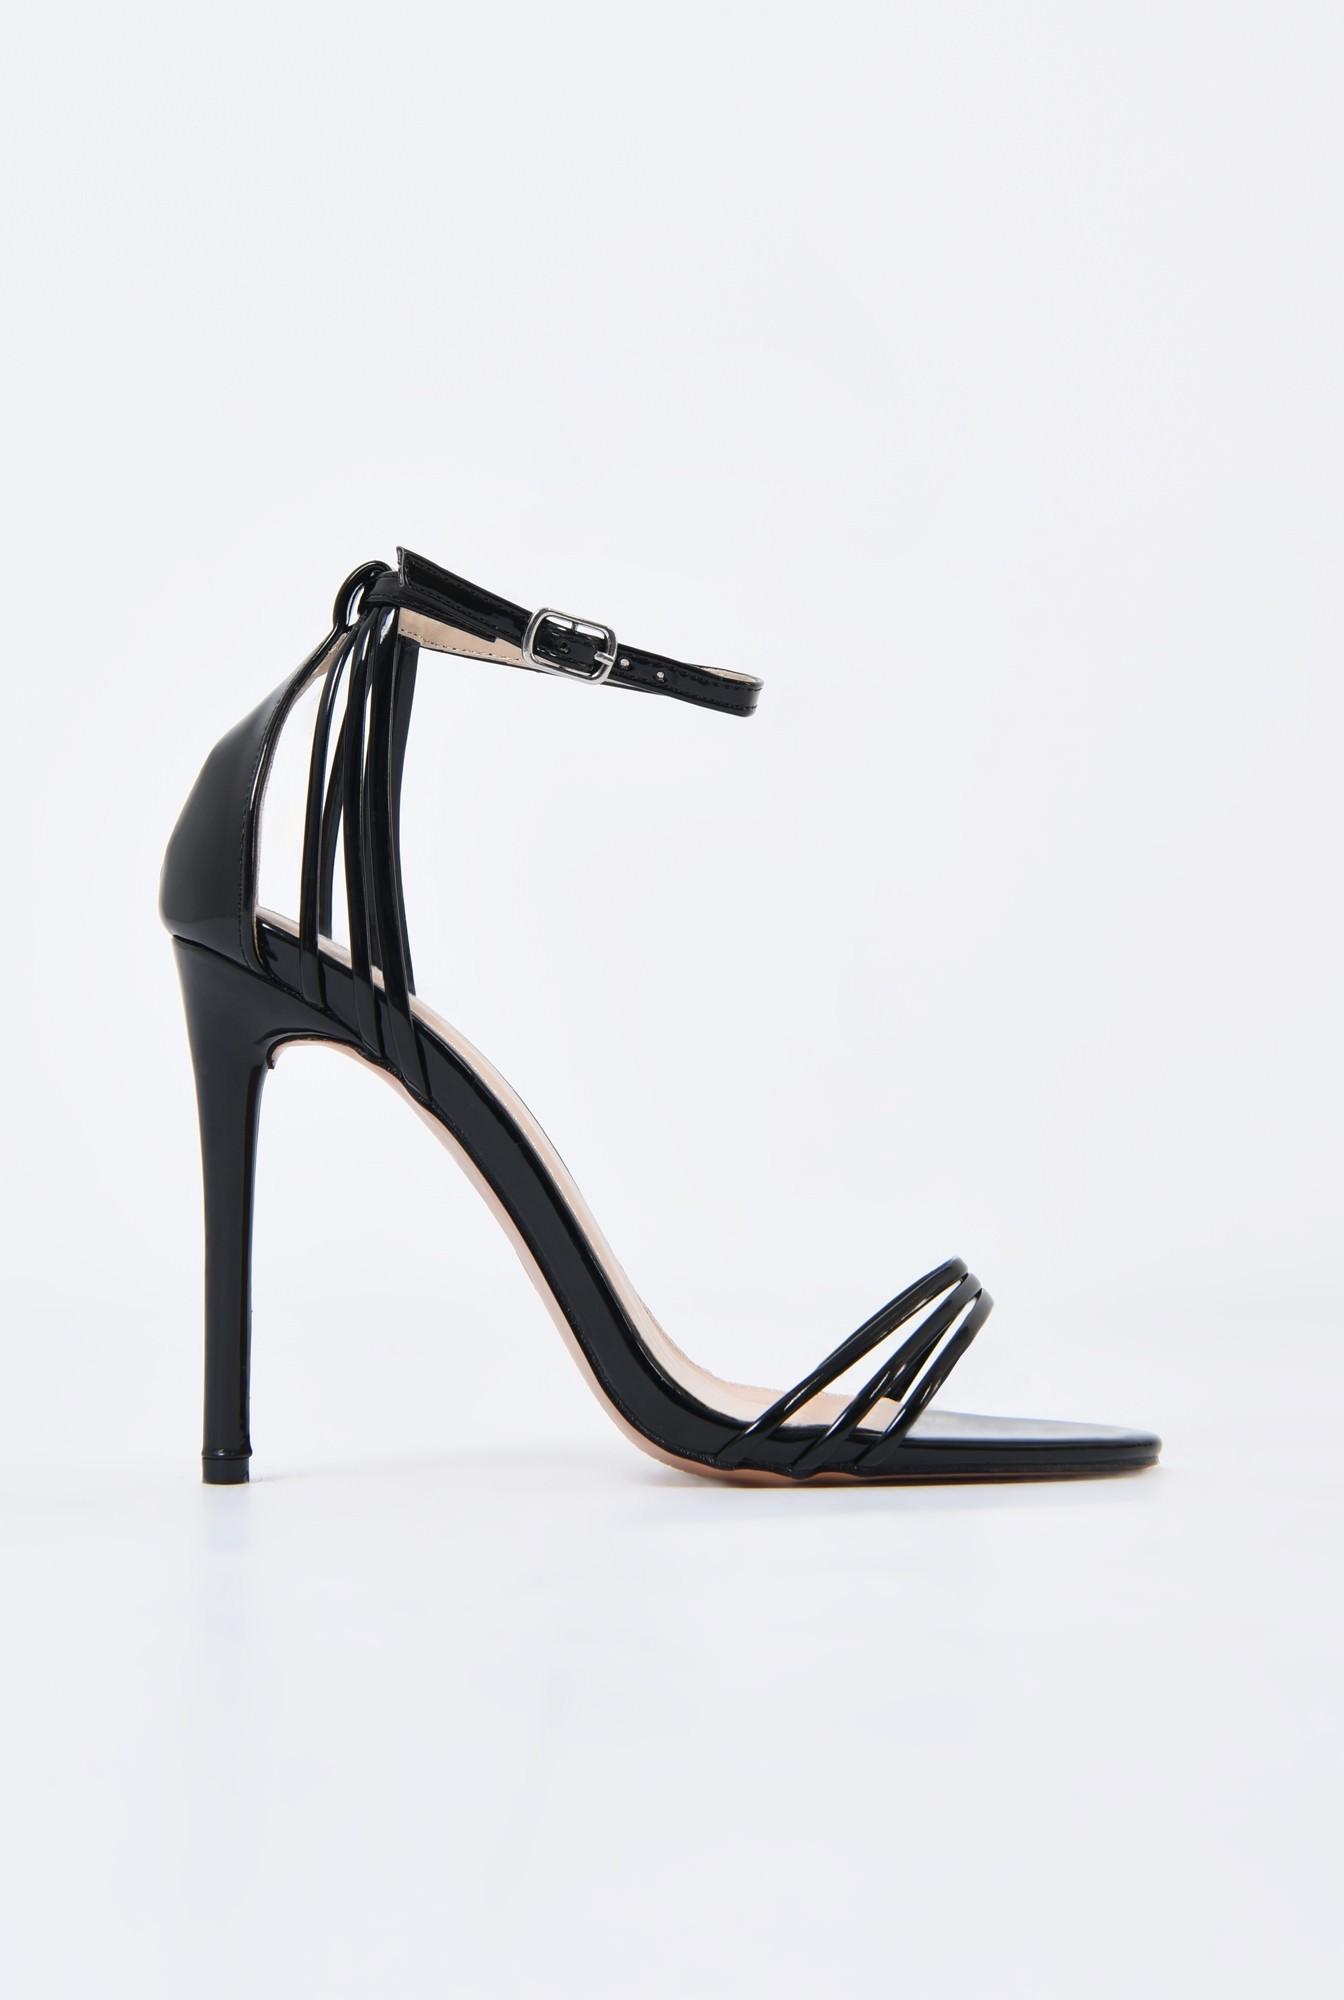 0 - sandale elegante, din lac, negre, toc stiletto